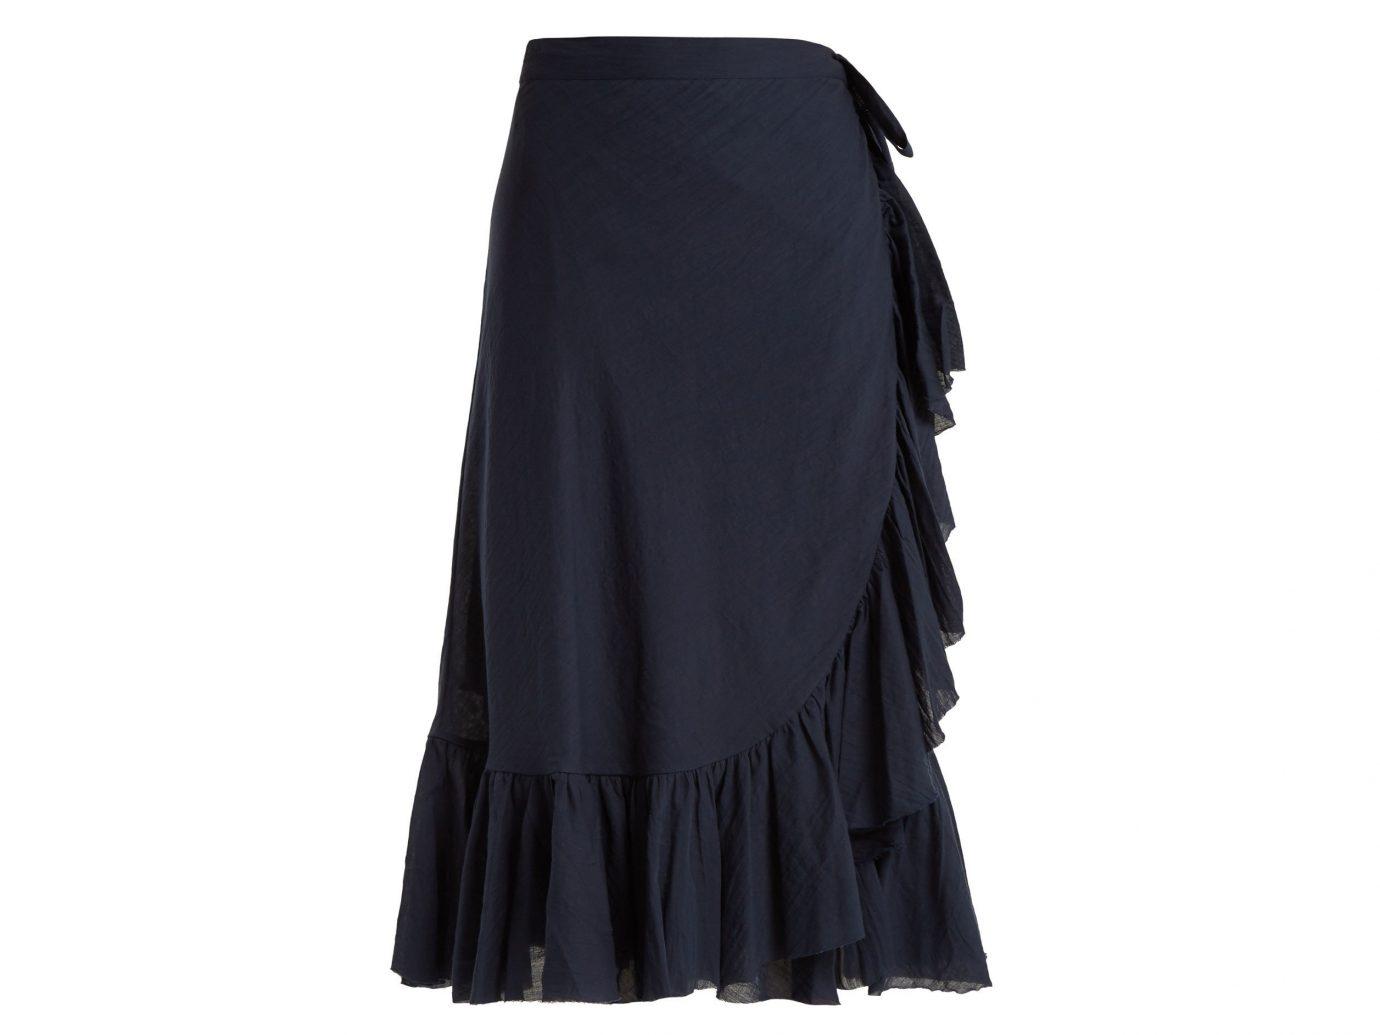 Style + Design Travel Shop clothing dress day dress ruffle joint skirt